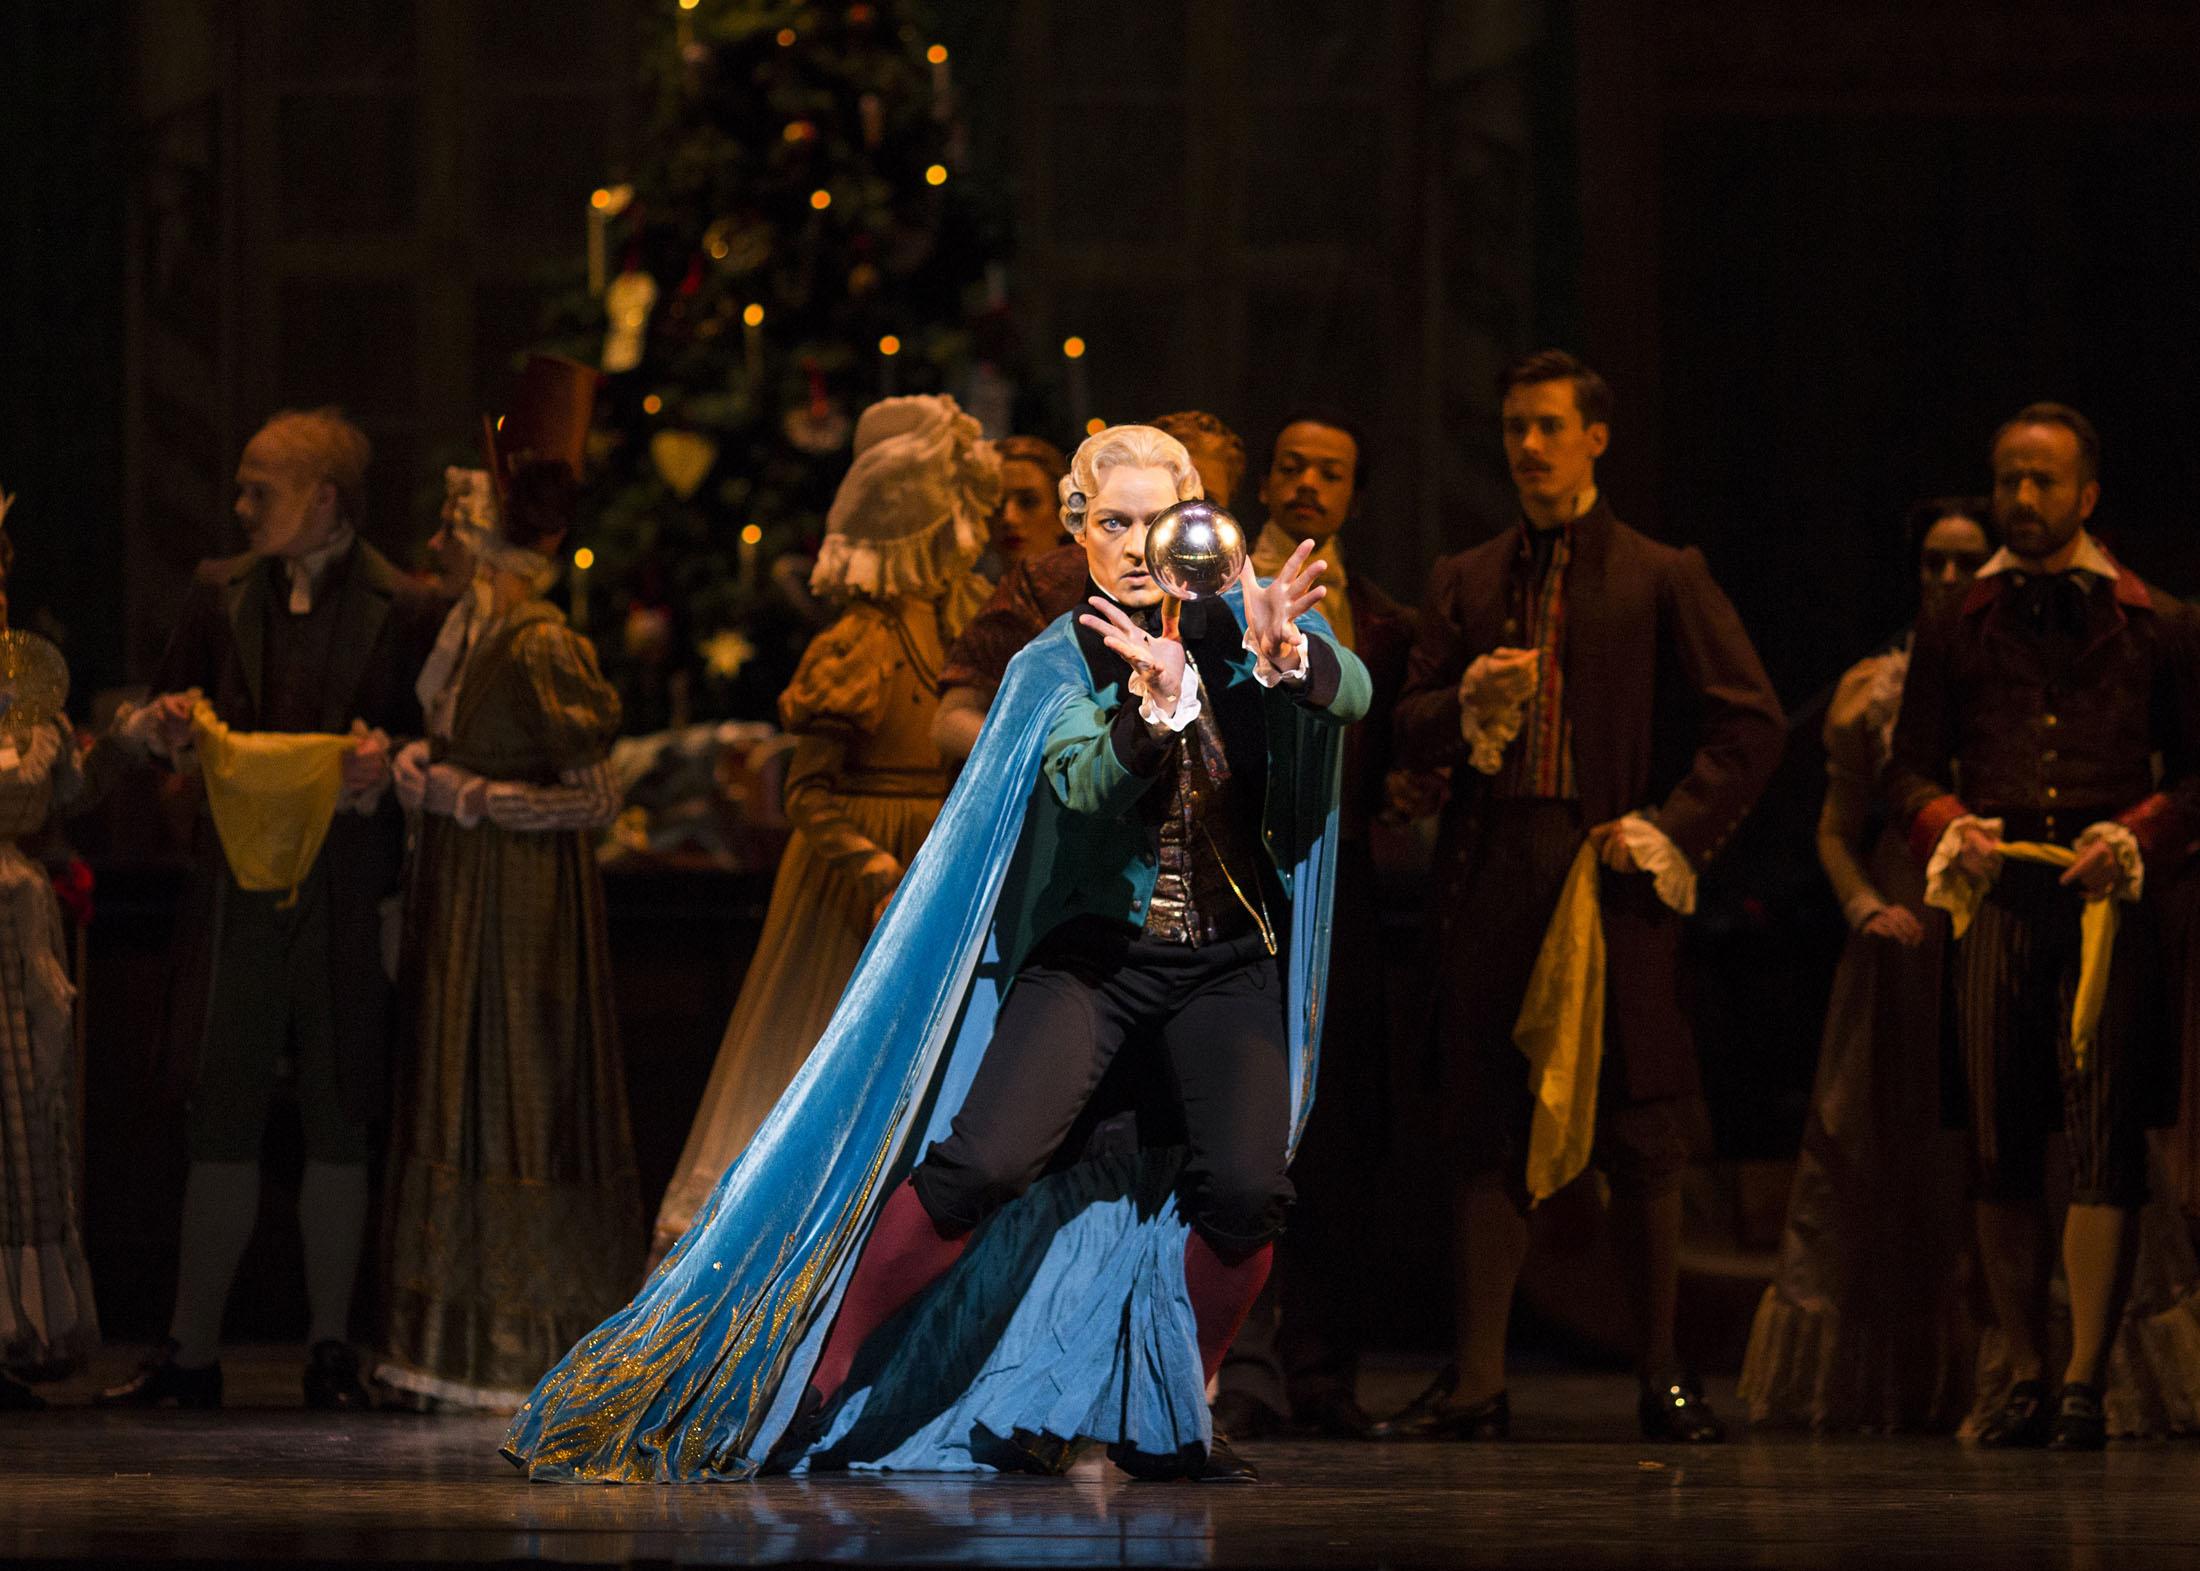 The Nutcracker: Meet the Characters – Royal Opera House